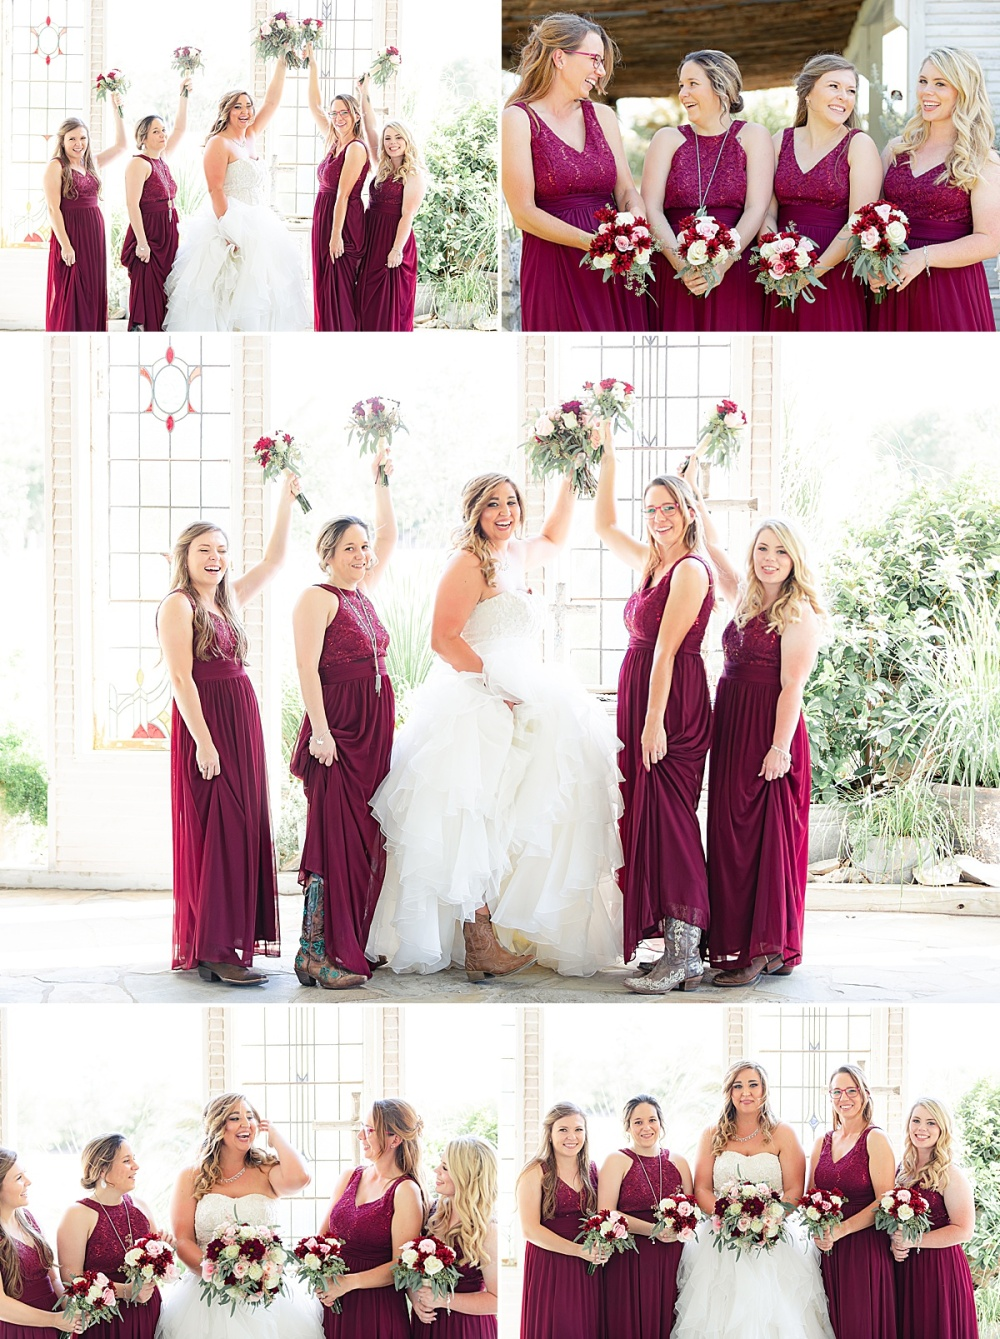 Navy-Burgundy-Texas-Wedding-Gruene-Estate-New-Braunfels-Carly-Barton-Photography_0048.jpg